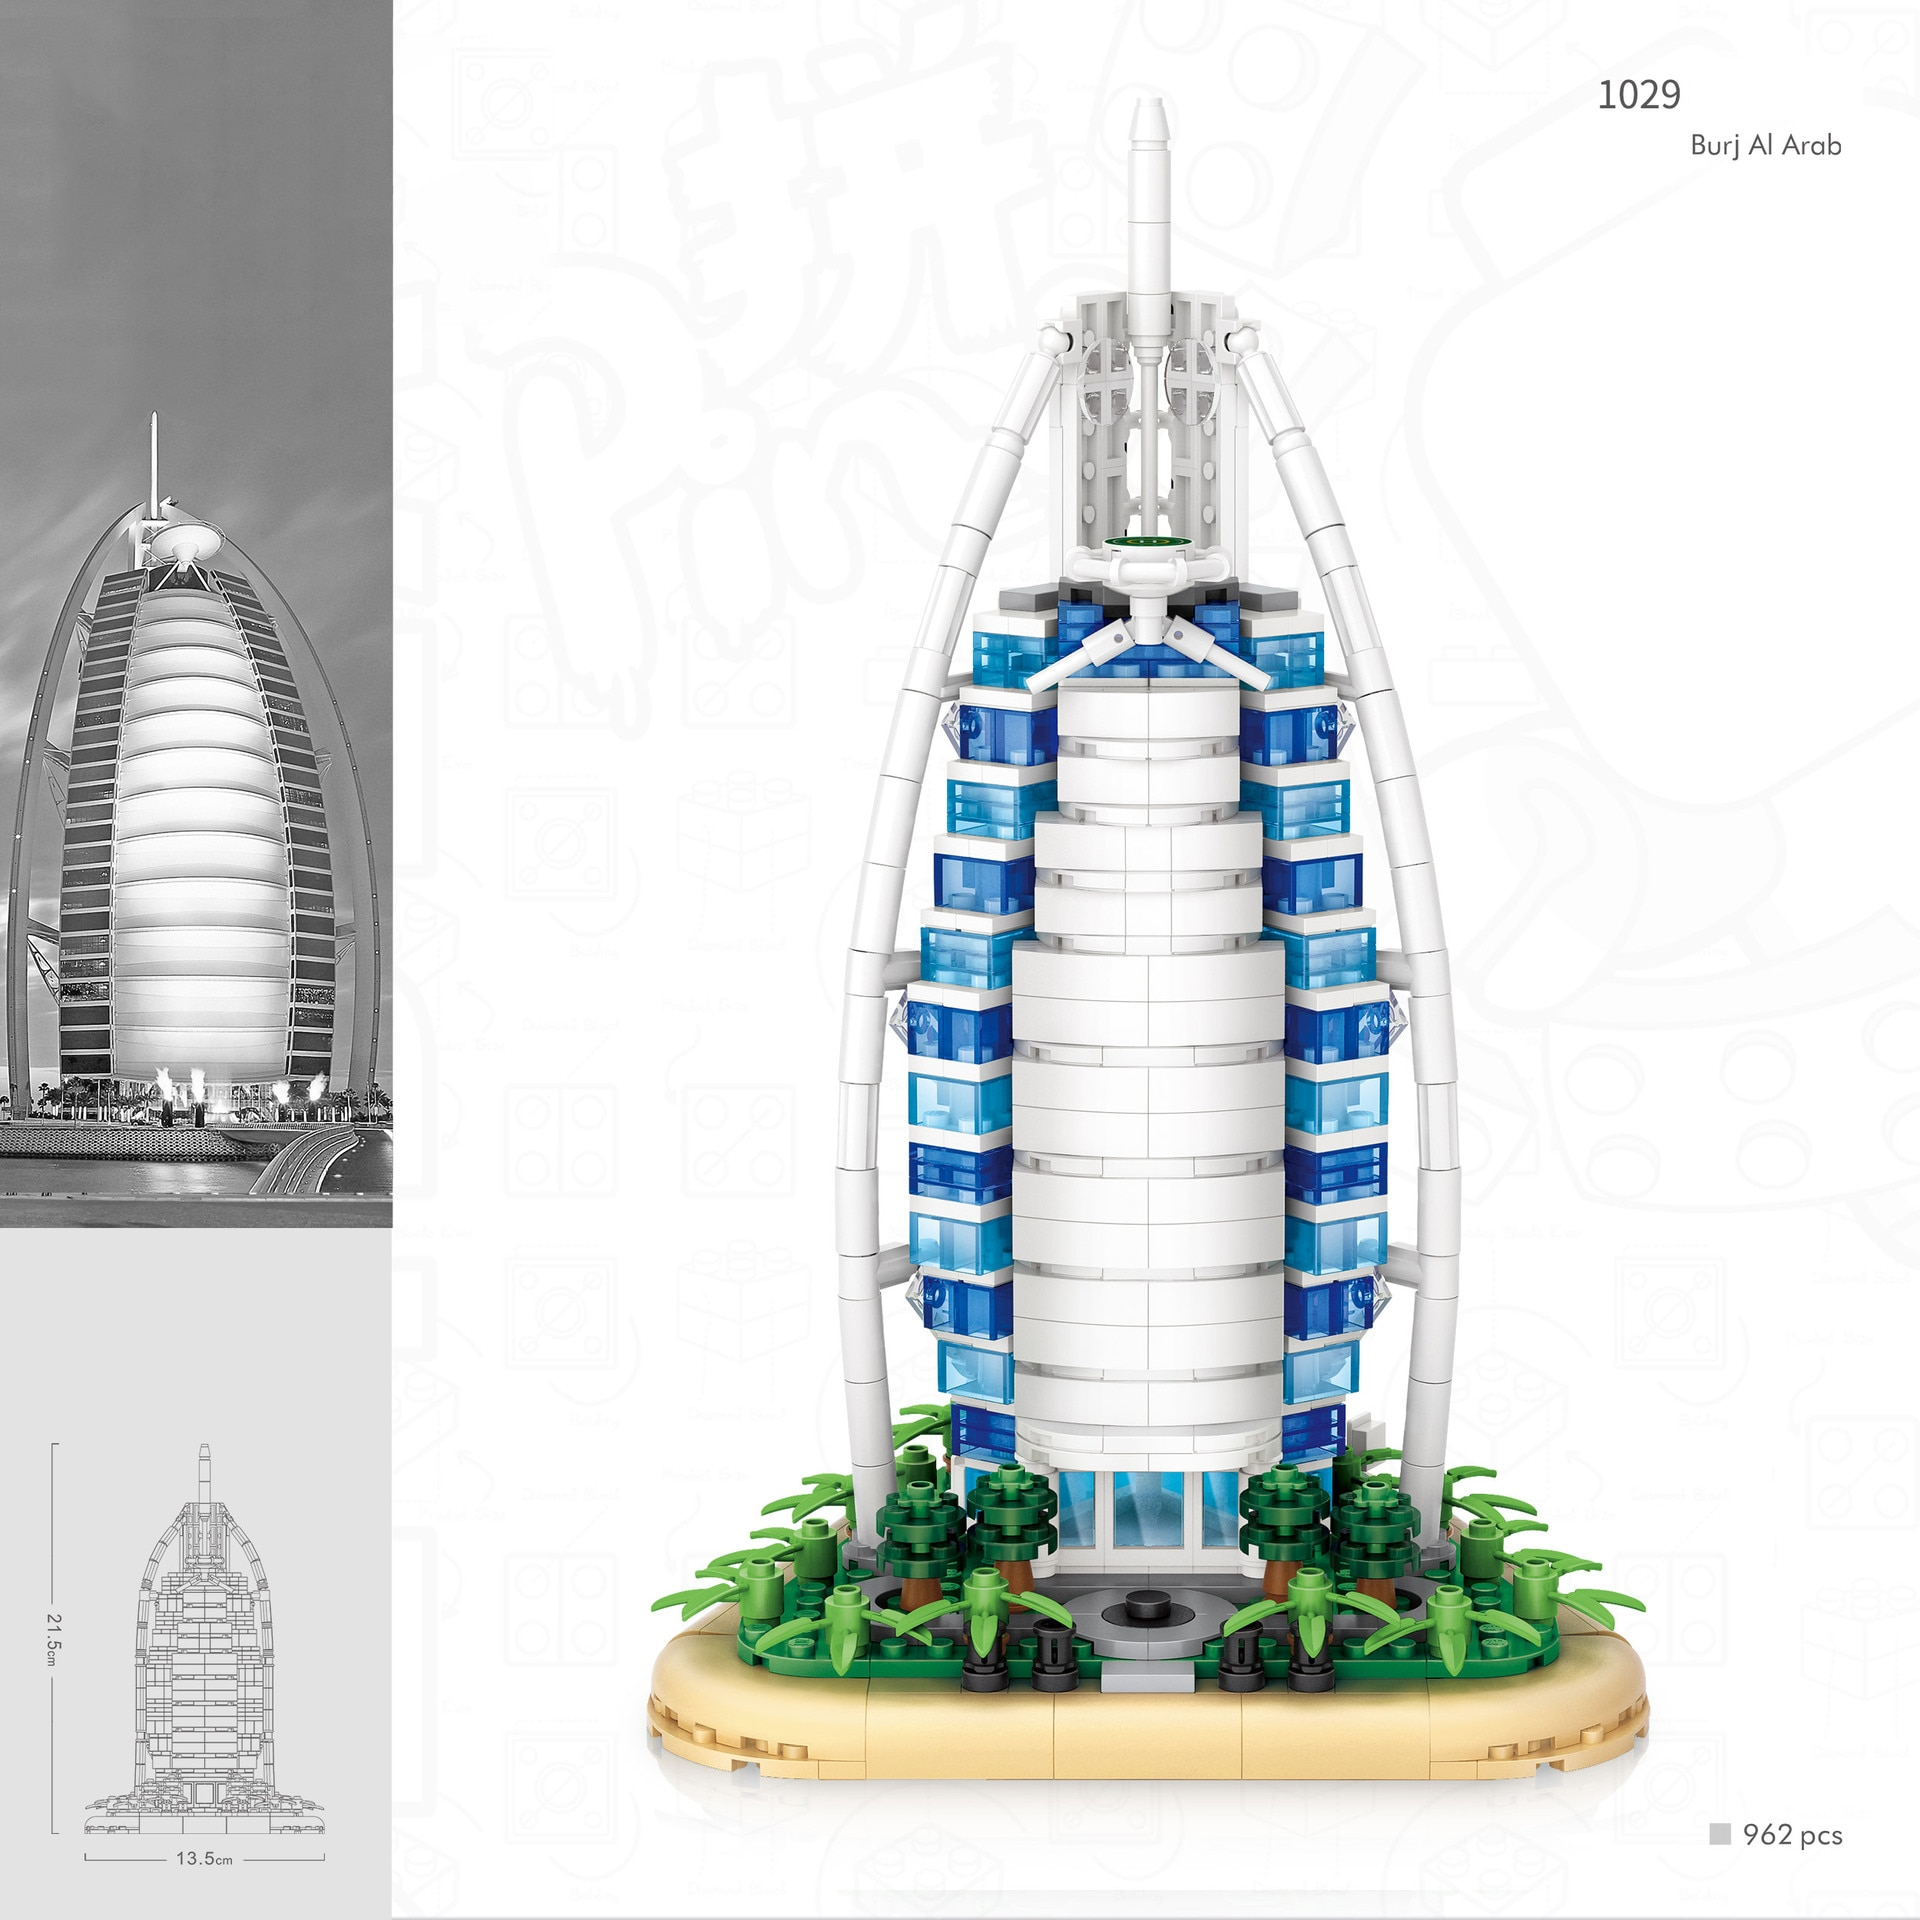 Creador de los Emiratos Árabes Unidos Dubai Burj Al árabe Loz mini bloque de construcción de diamante arquitectura famosa del mundo bloques de modelismo juguete